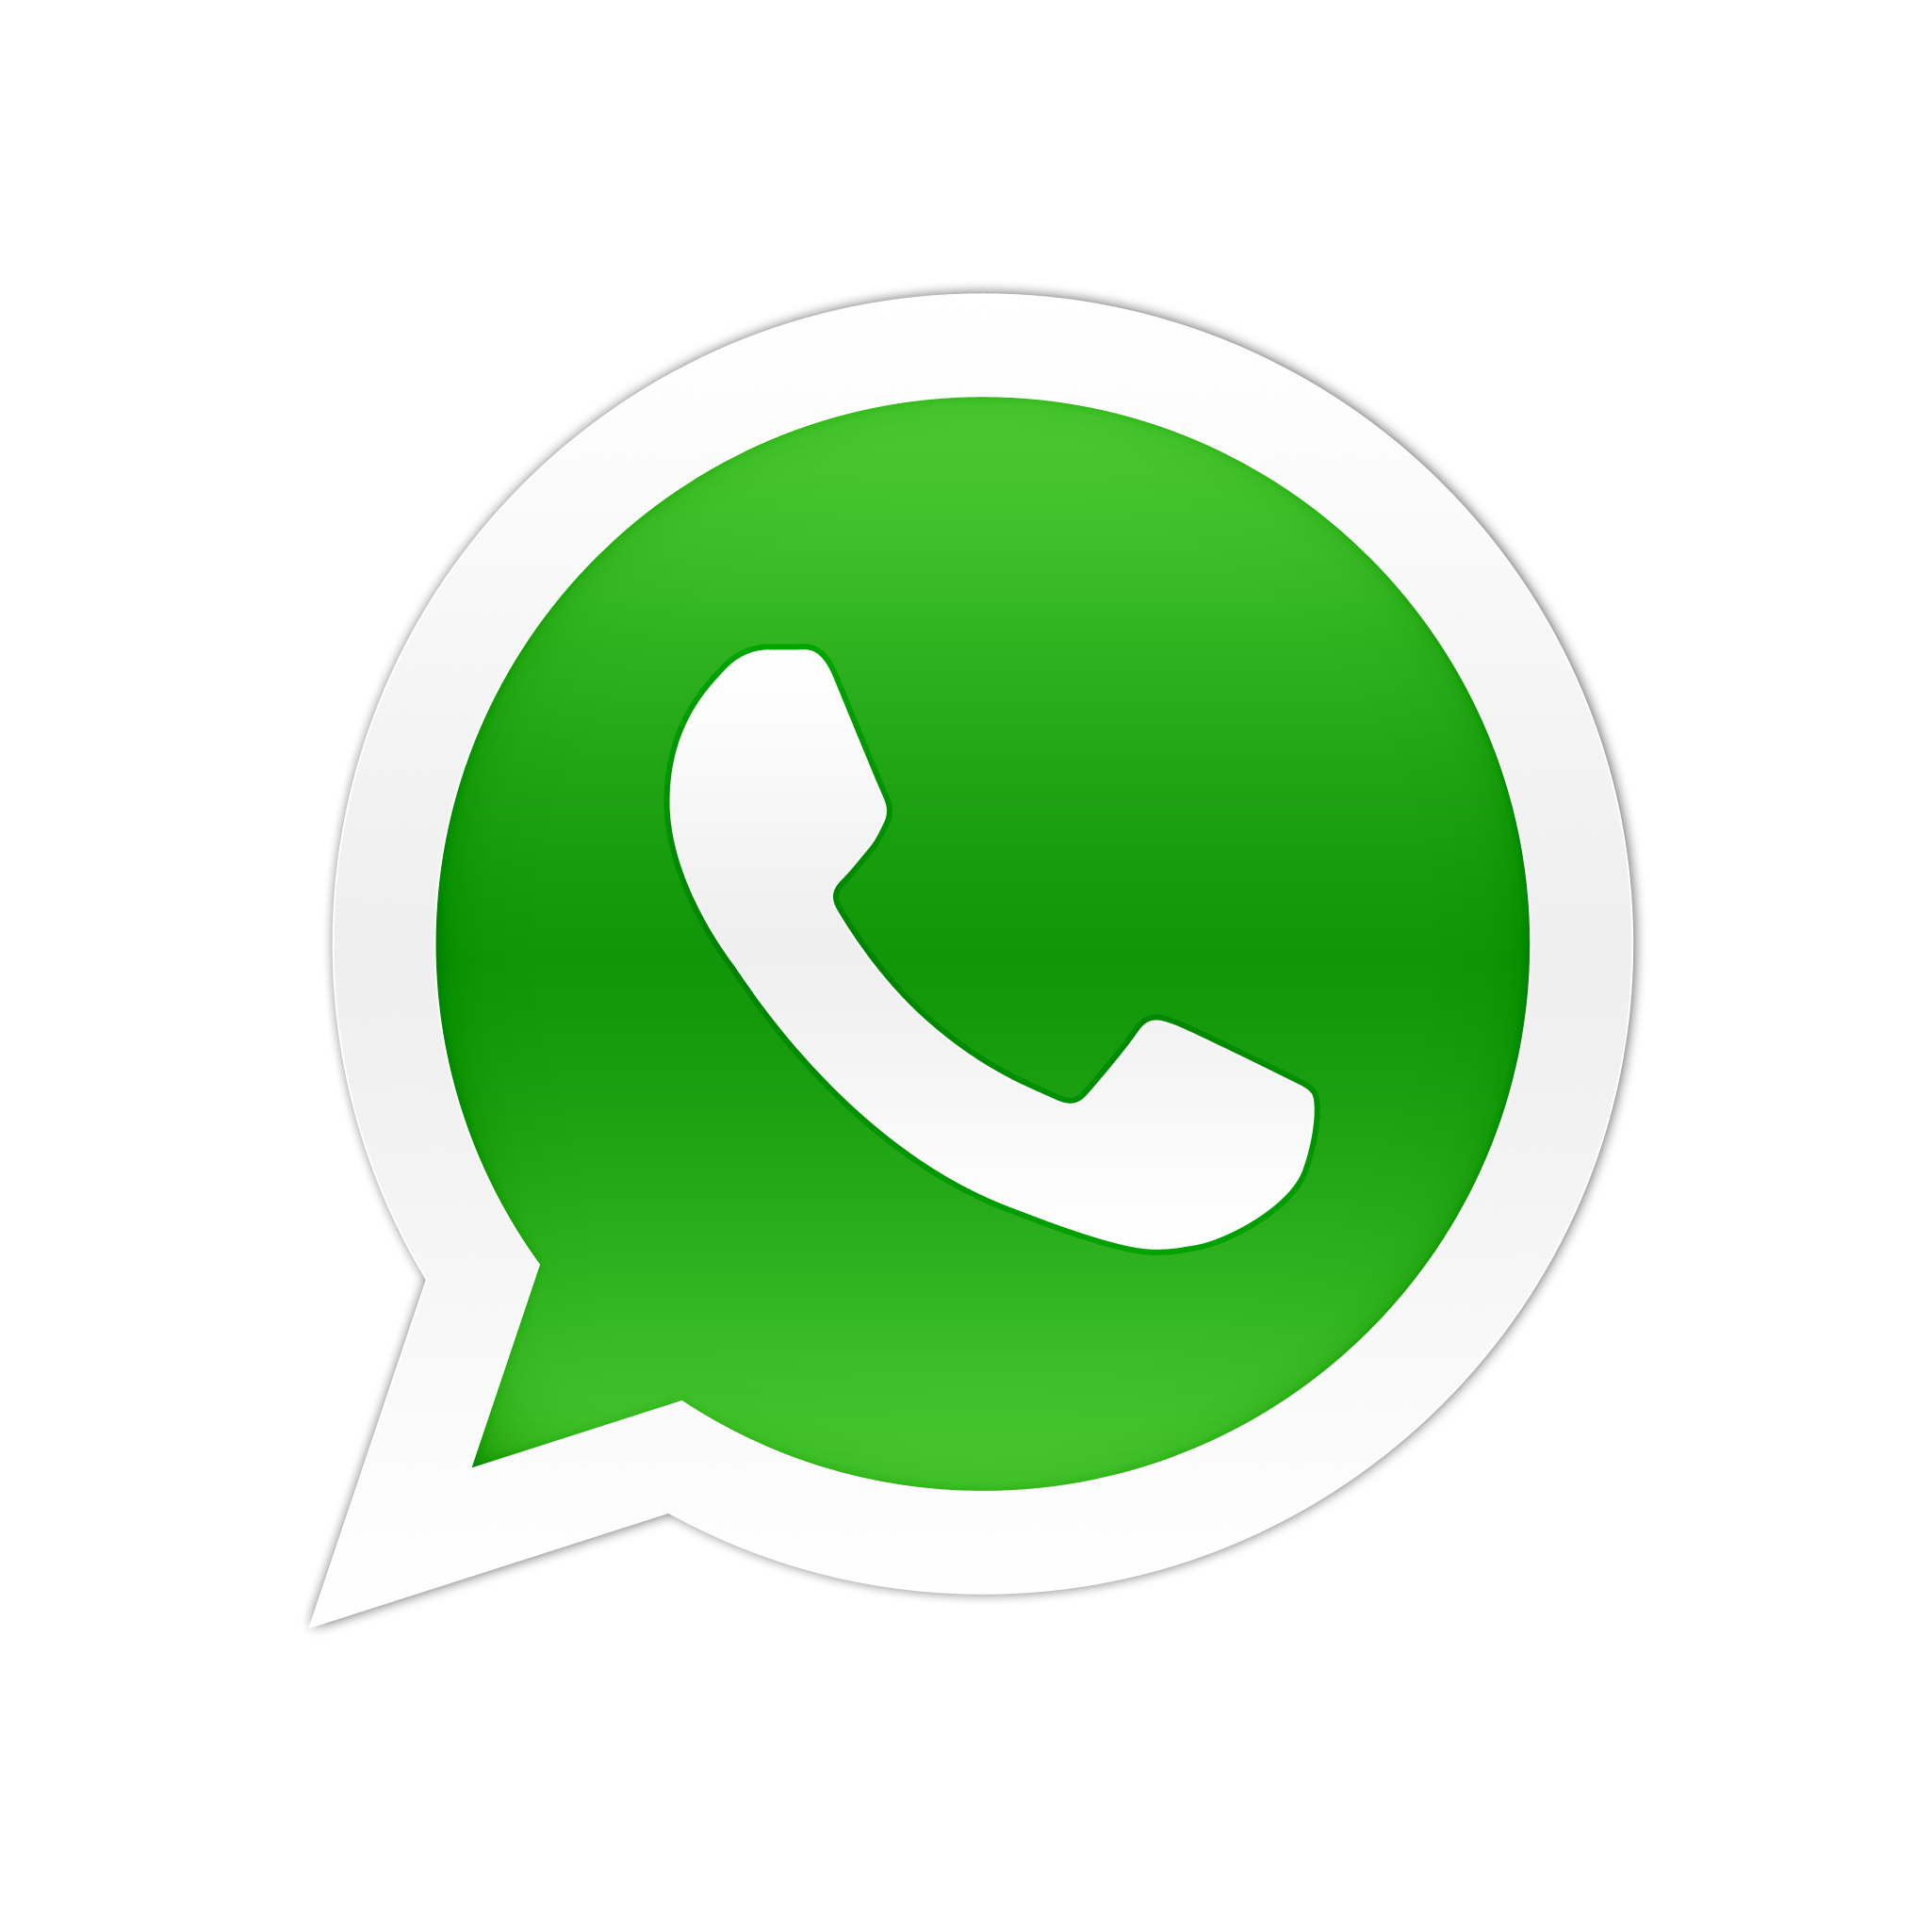 whatsapp_logo_png.png